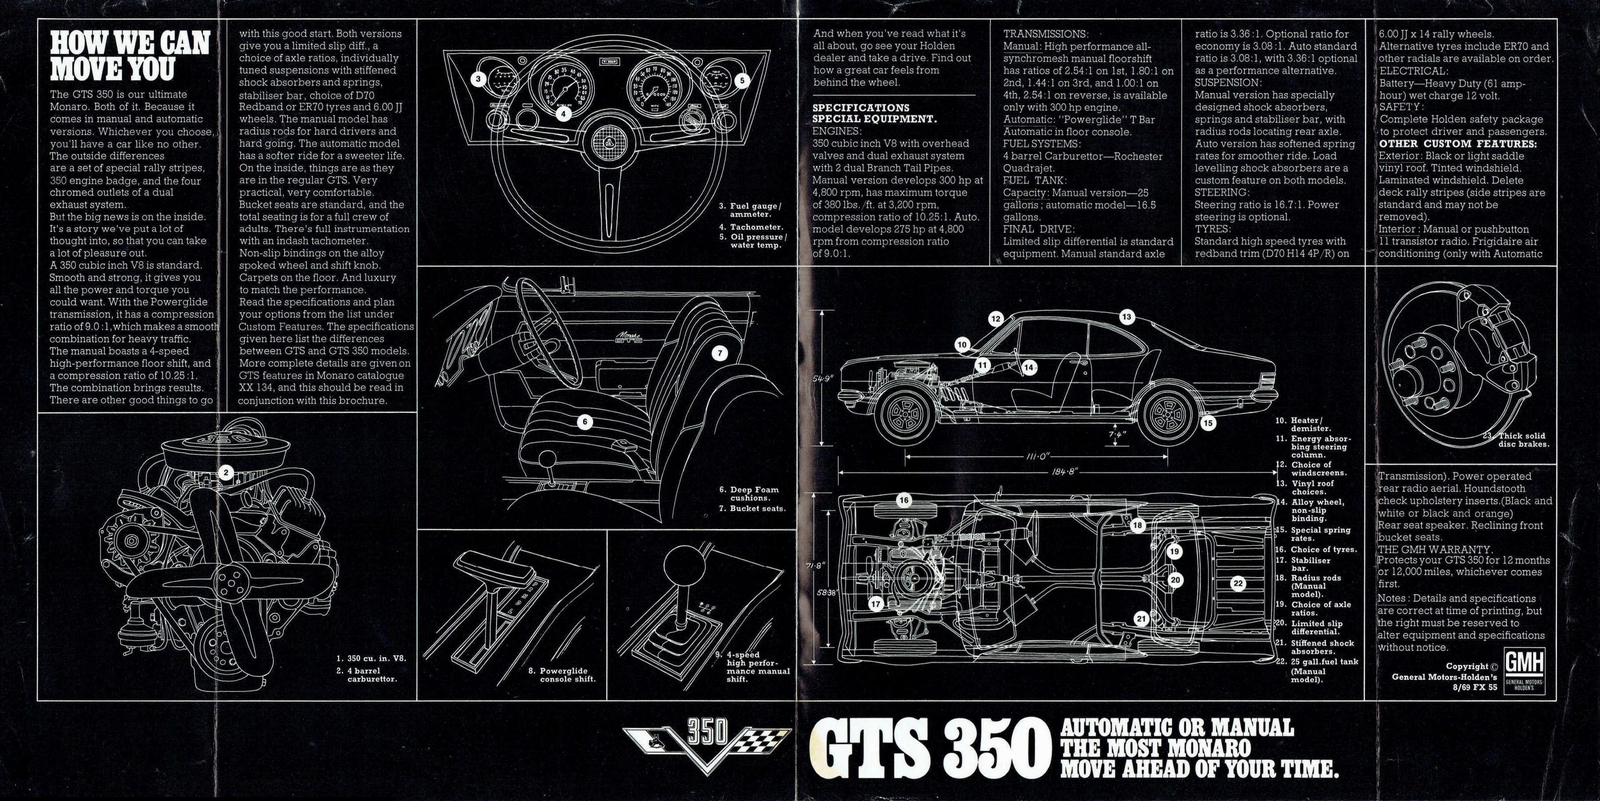 HT Monaro GTS 350 - the specifications